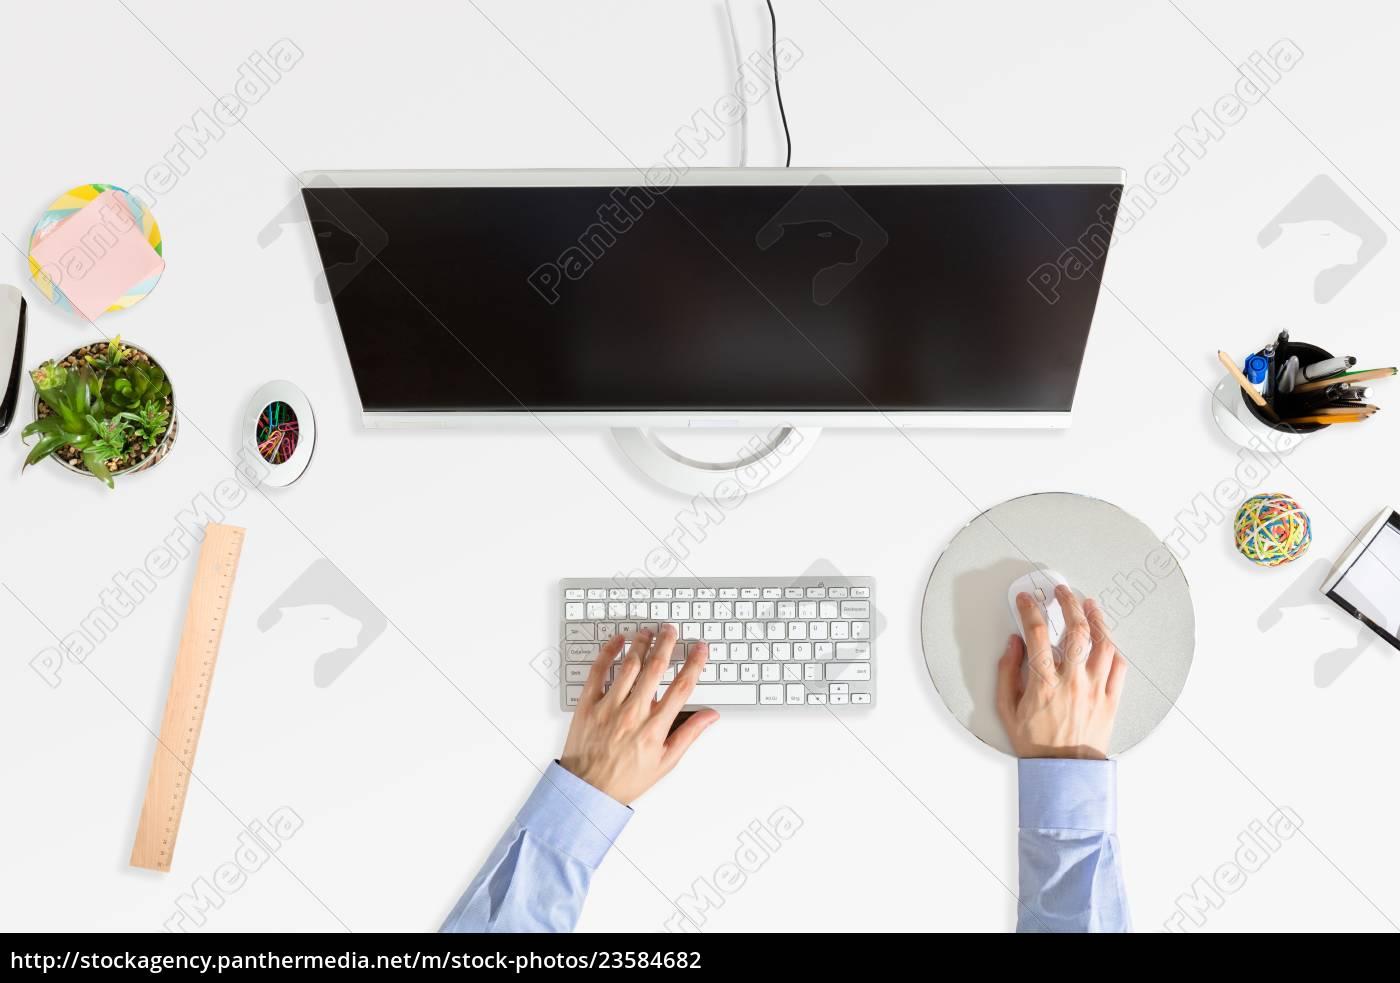 businessperson's, hand, working, on, computer - 23584682